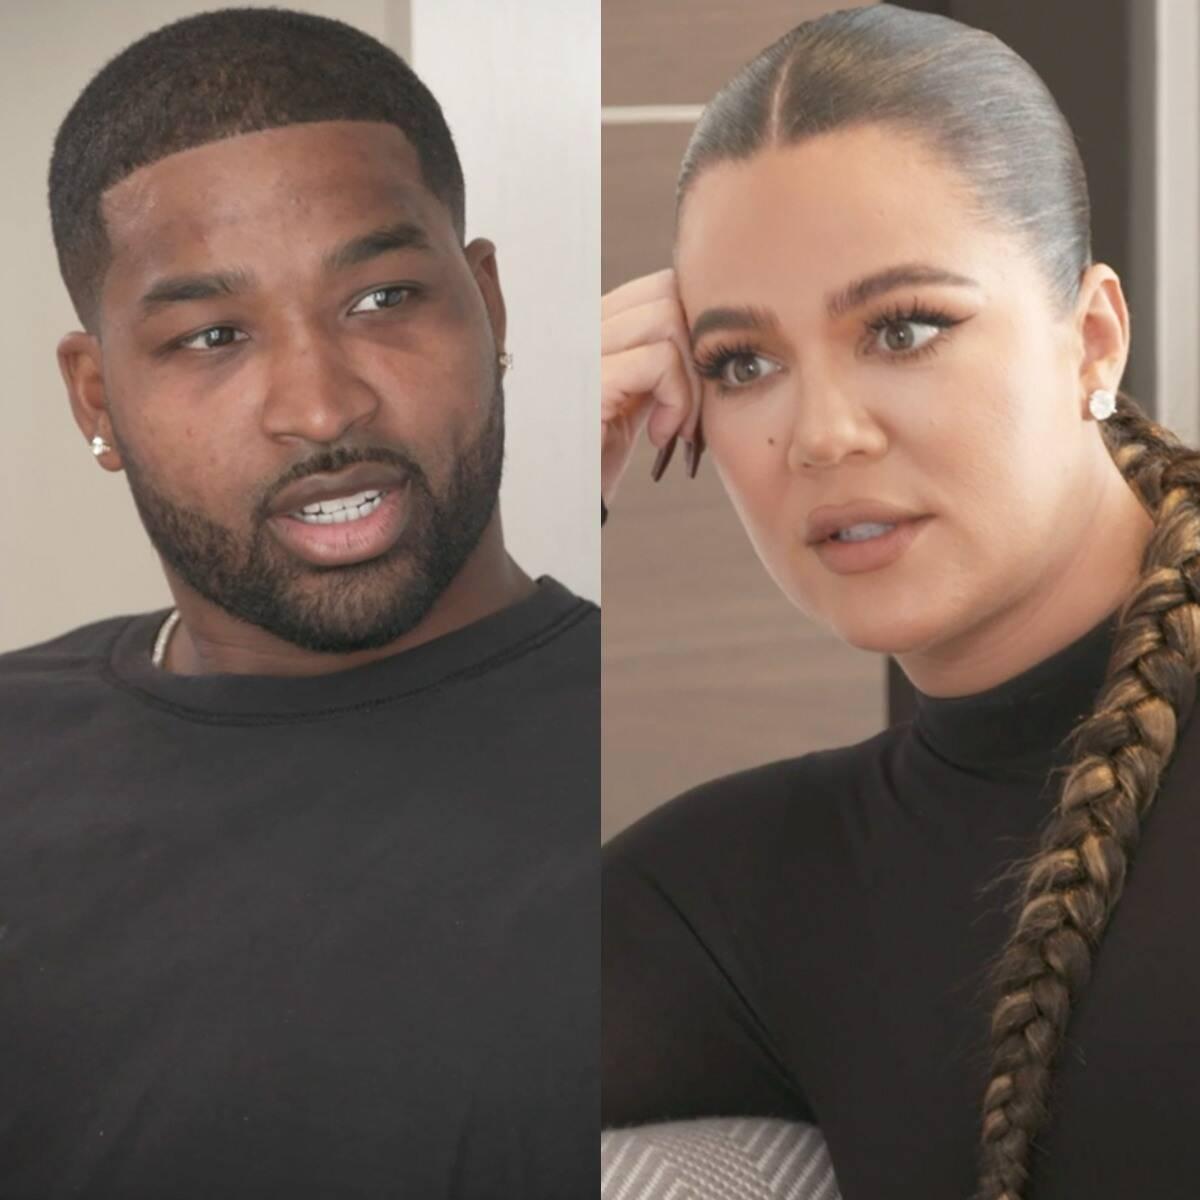 """khloe-kardashian-and-tristan-thompson-talk-surrogacy-in-new-teaser-for-the-final-kuwtk-season"""